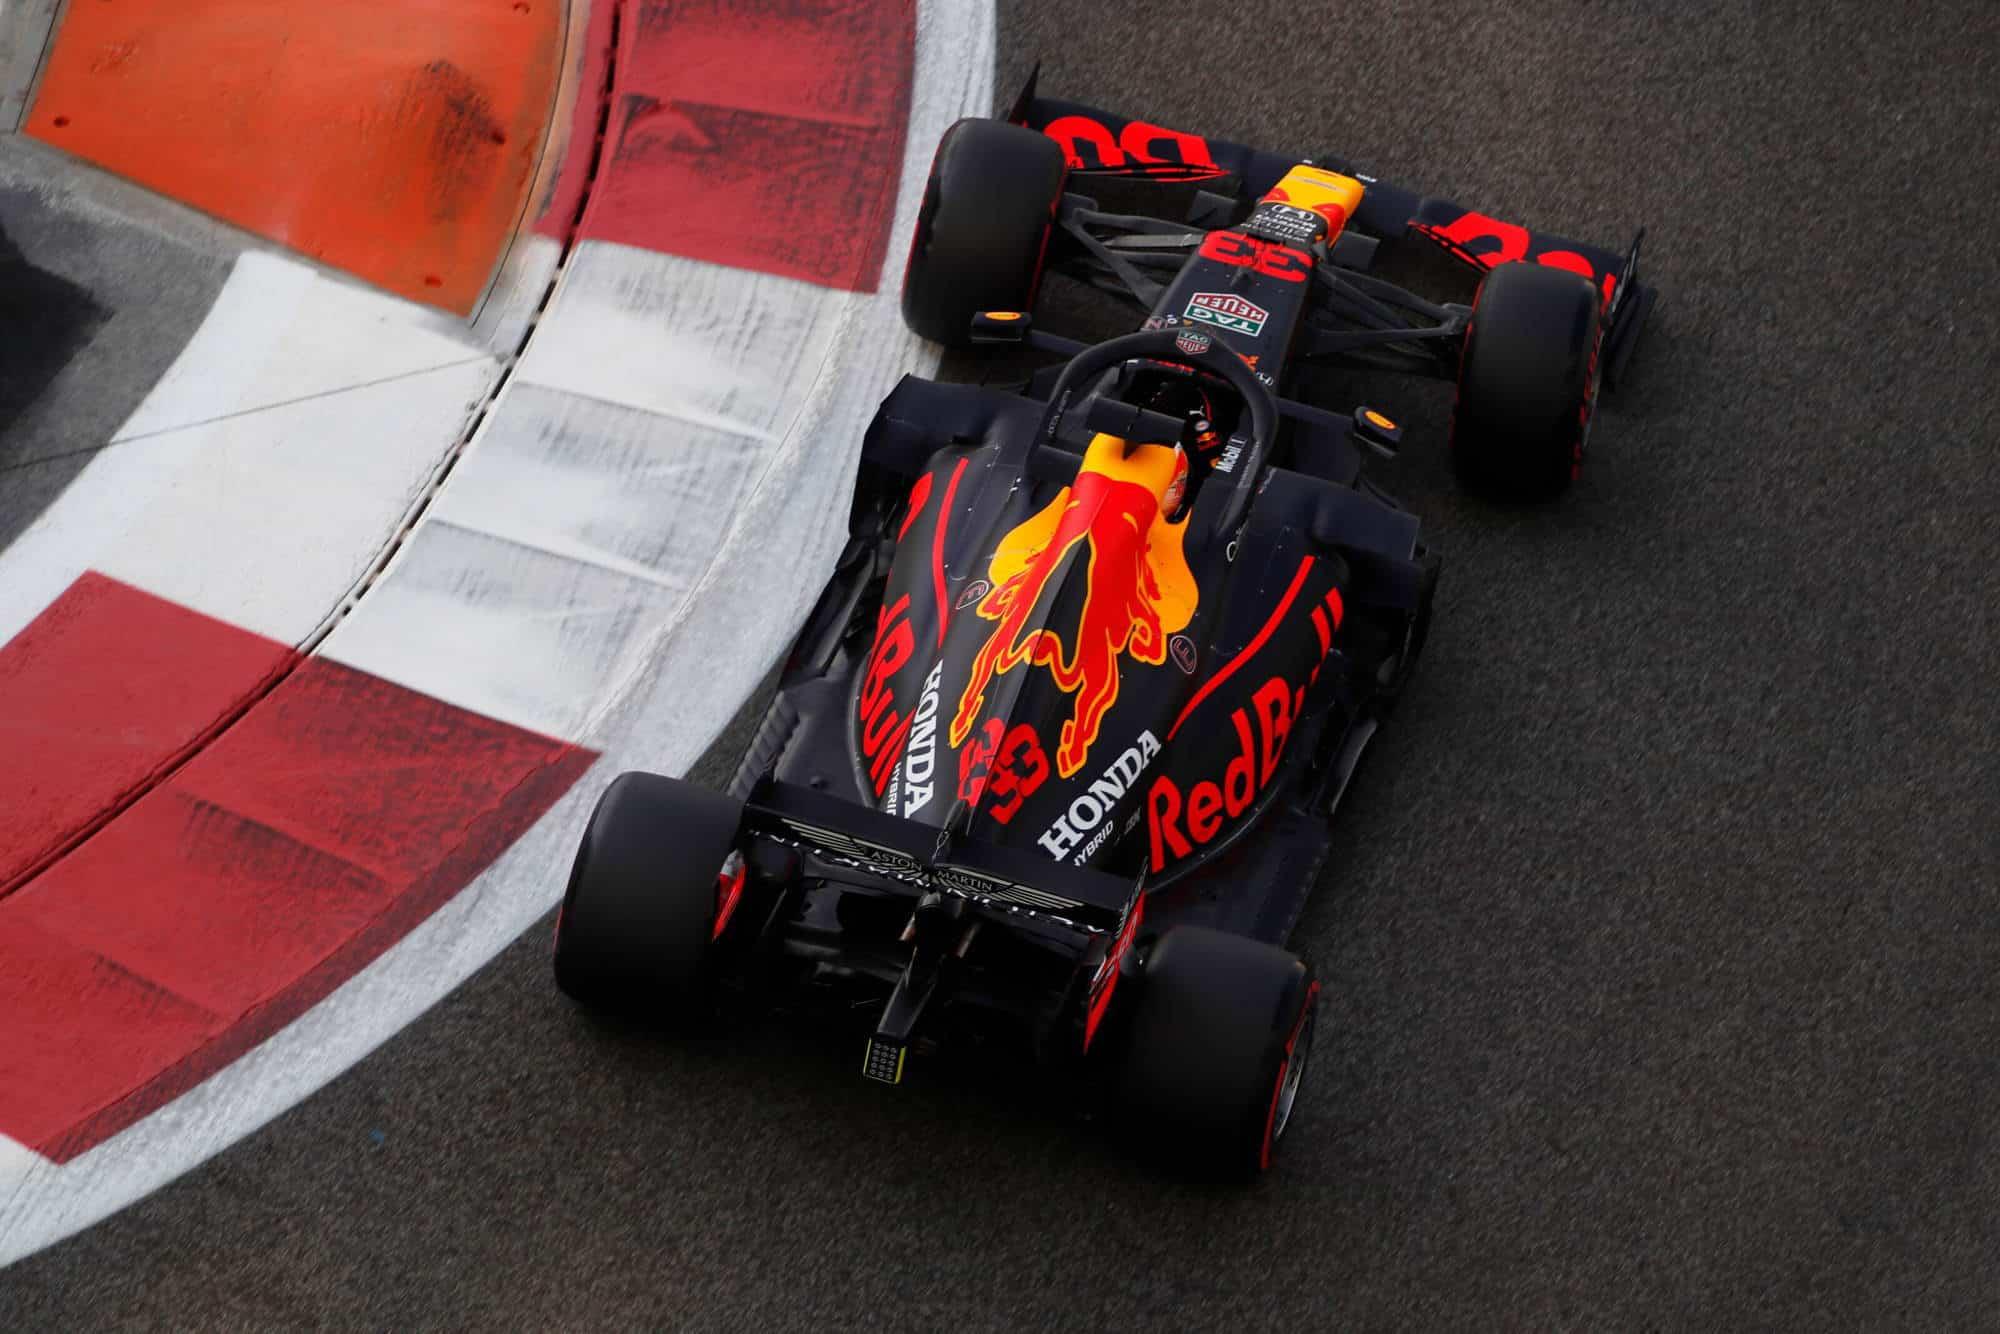 2020 Abu Dhabi GP Verstappen Red Bull FP3 soft top view Photo Red Bull